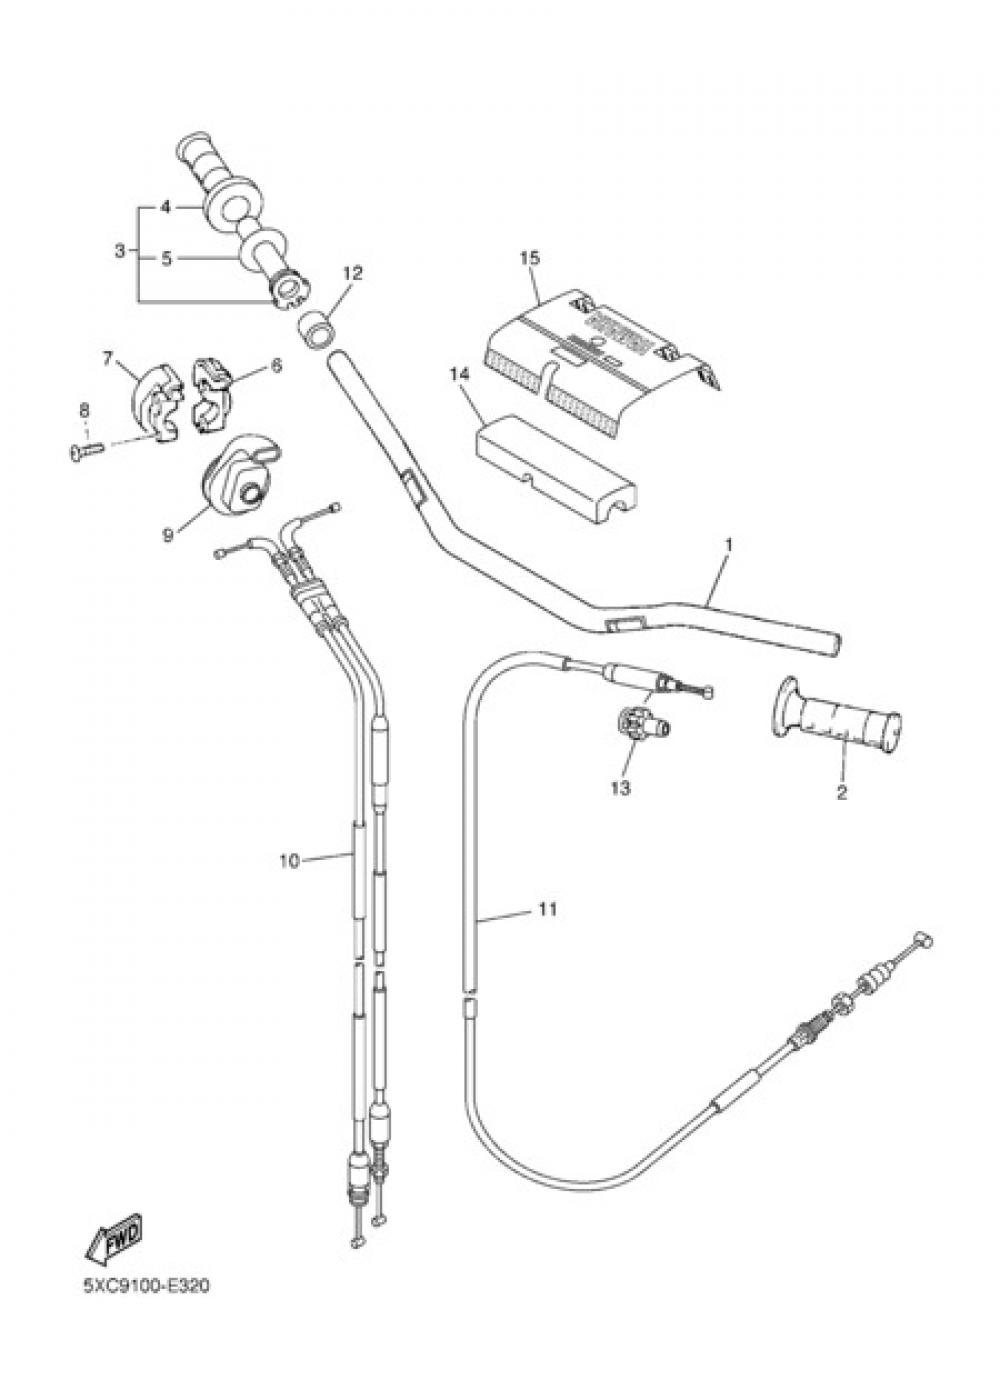 STEERING HANDLE & CABLE Yamaha YZ250F 2008